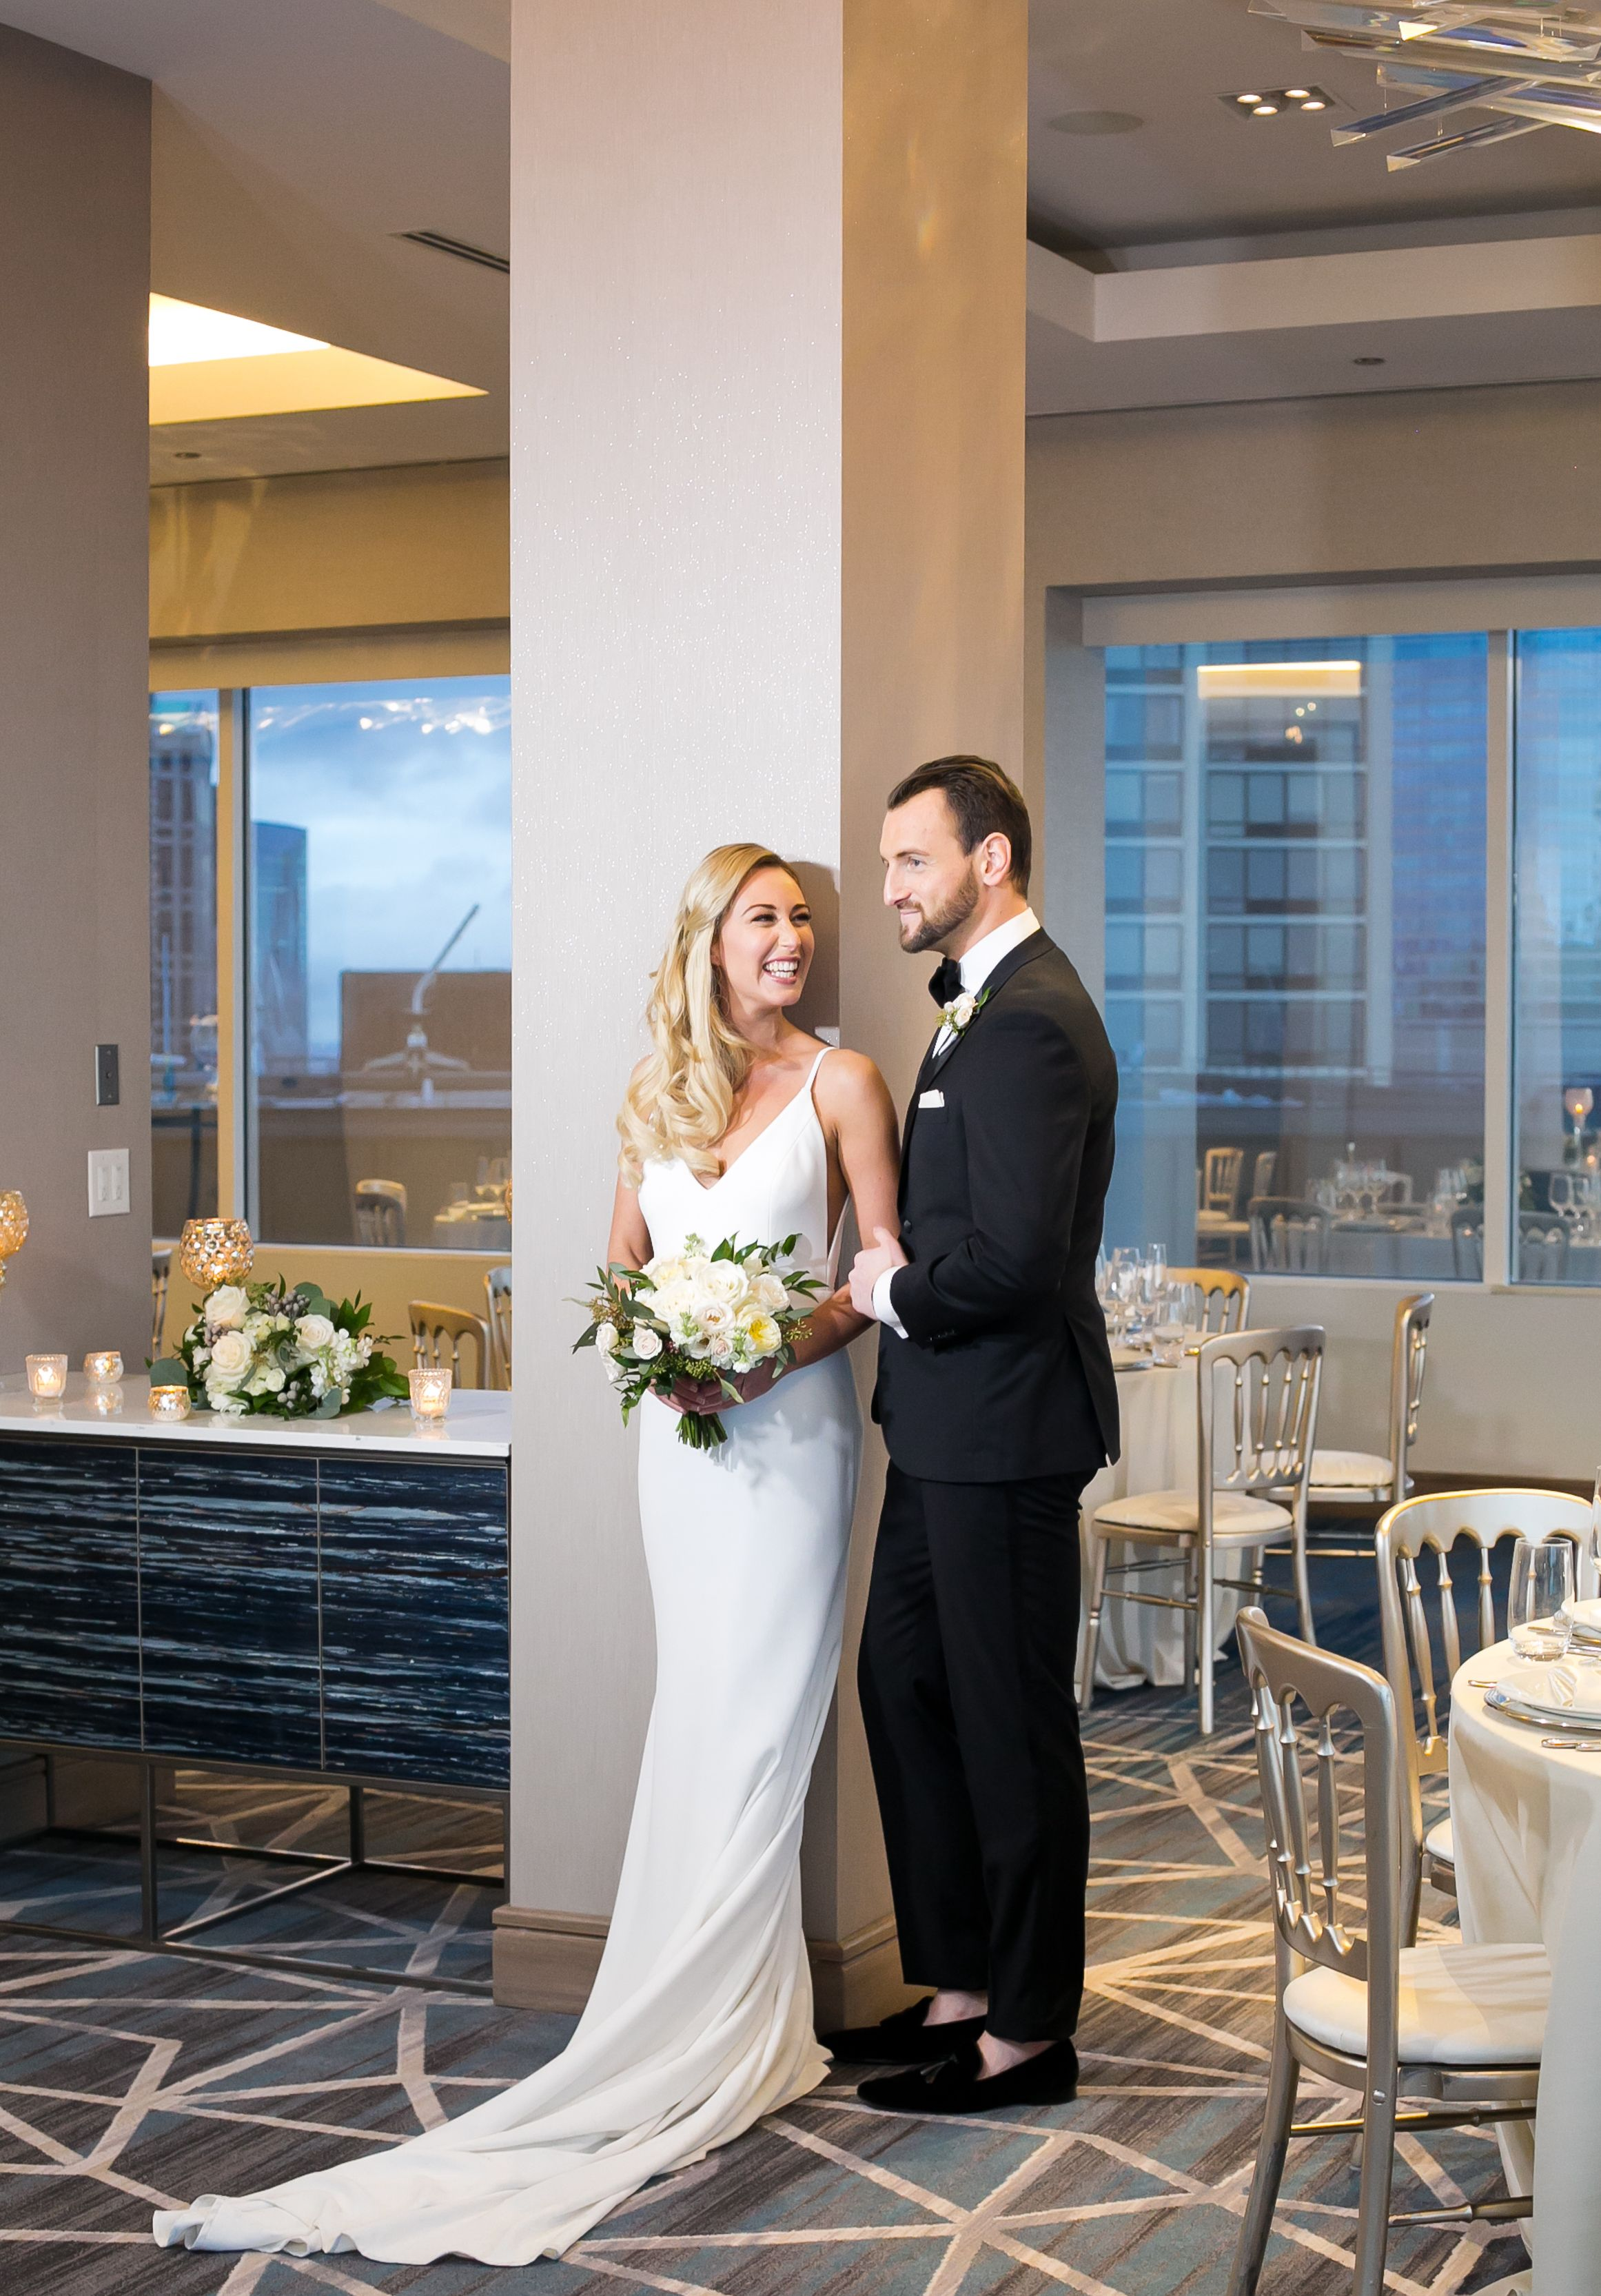 Alyssa Kristin Wedding Dress Wedding Dresses Designer Wedding Dresses Dresses